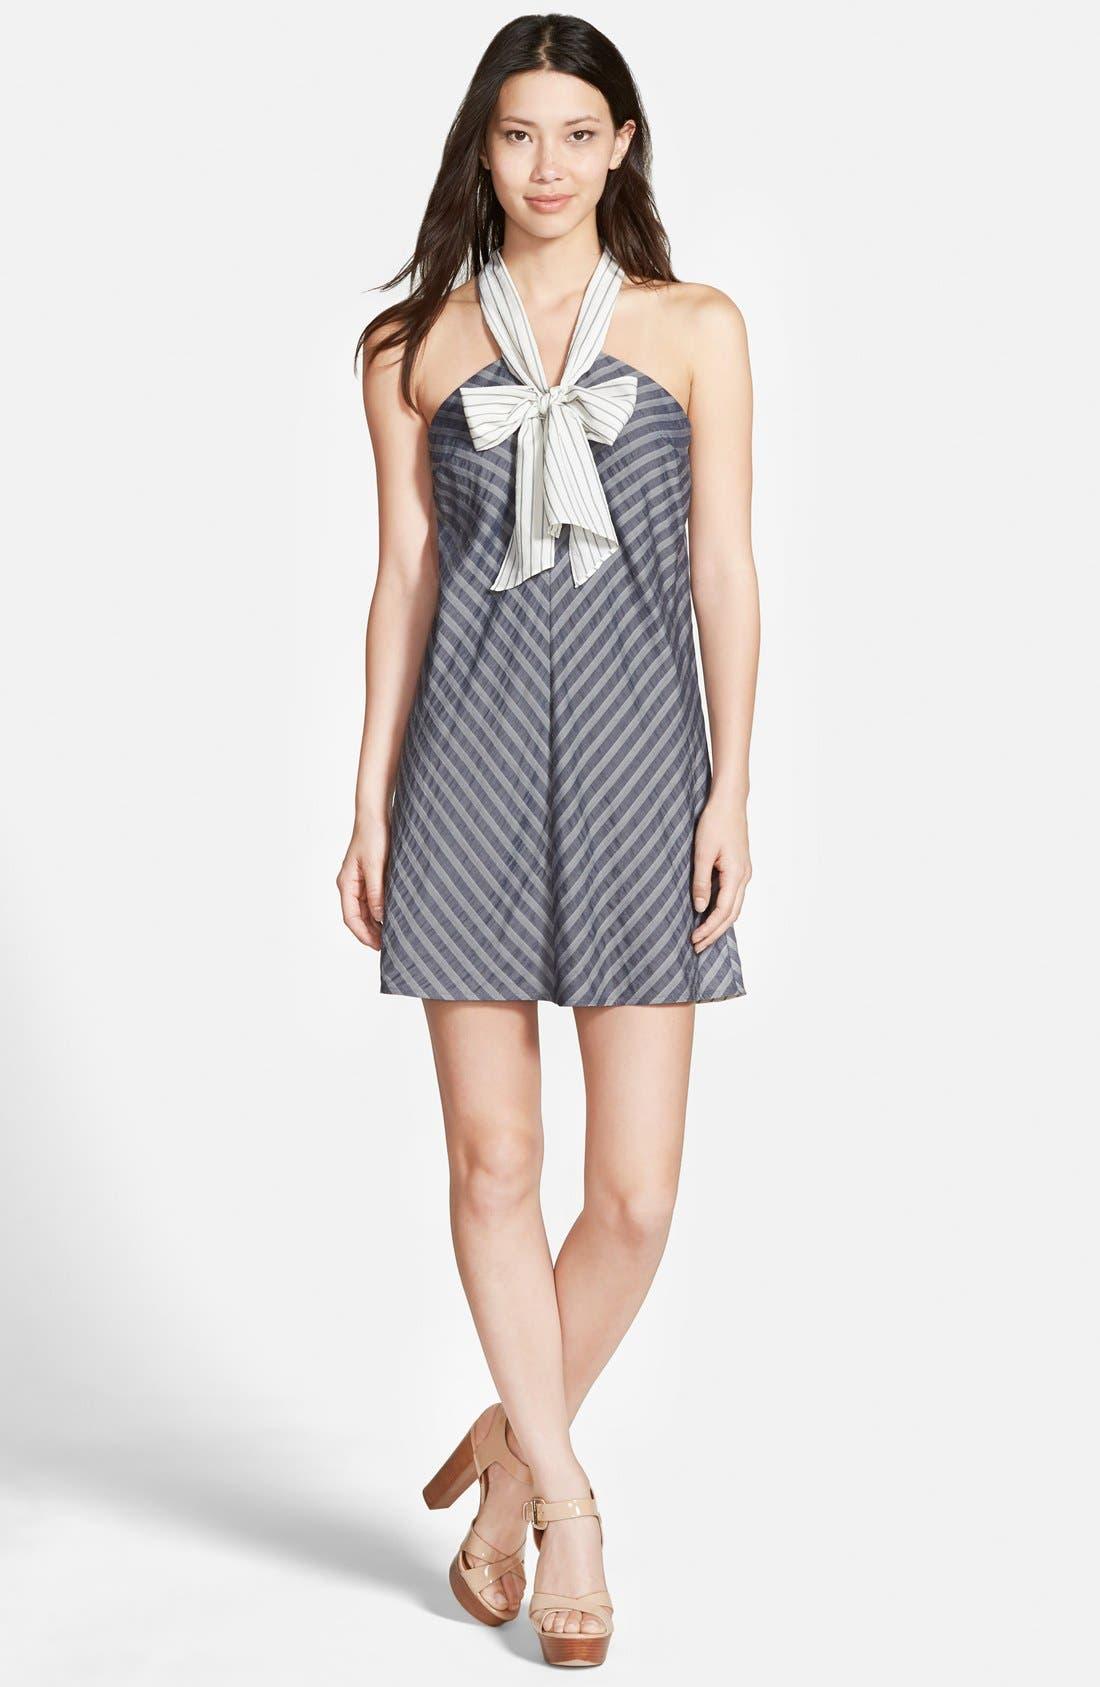 Alternate Image 1 Selected - cooper & ella 'Hannah' Bow Dress